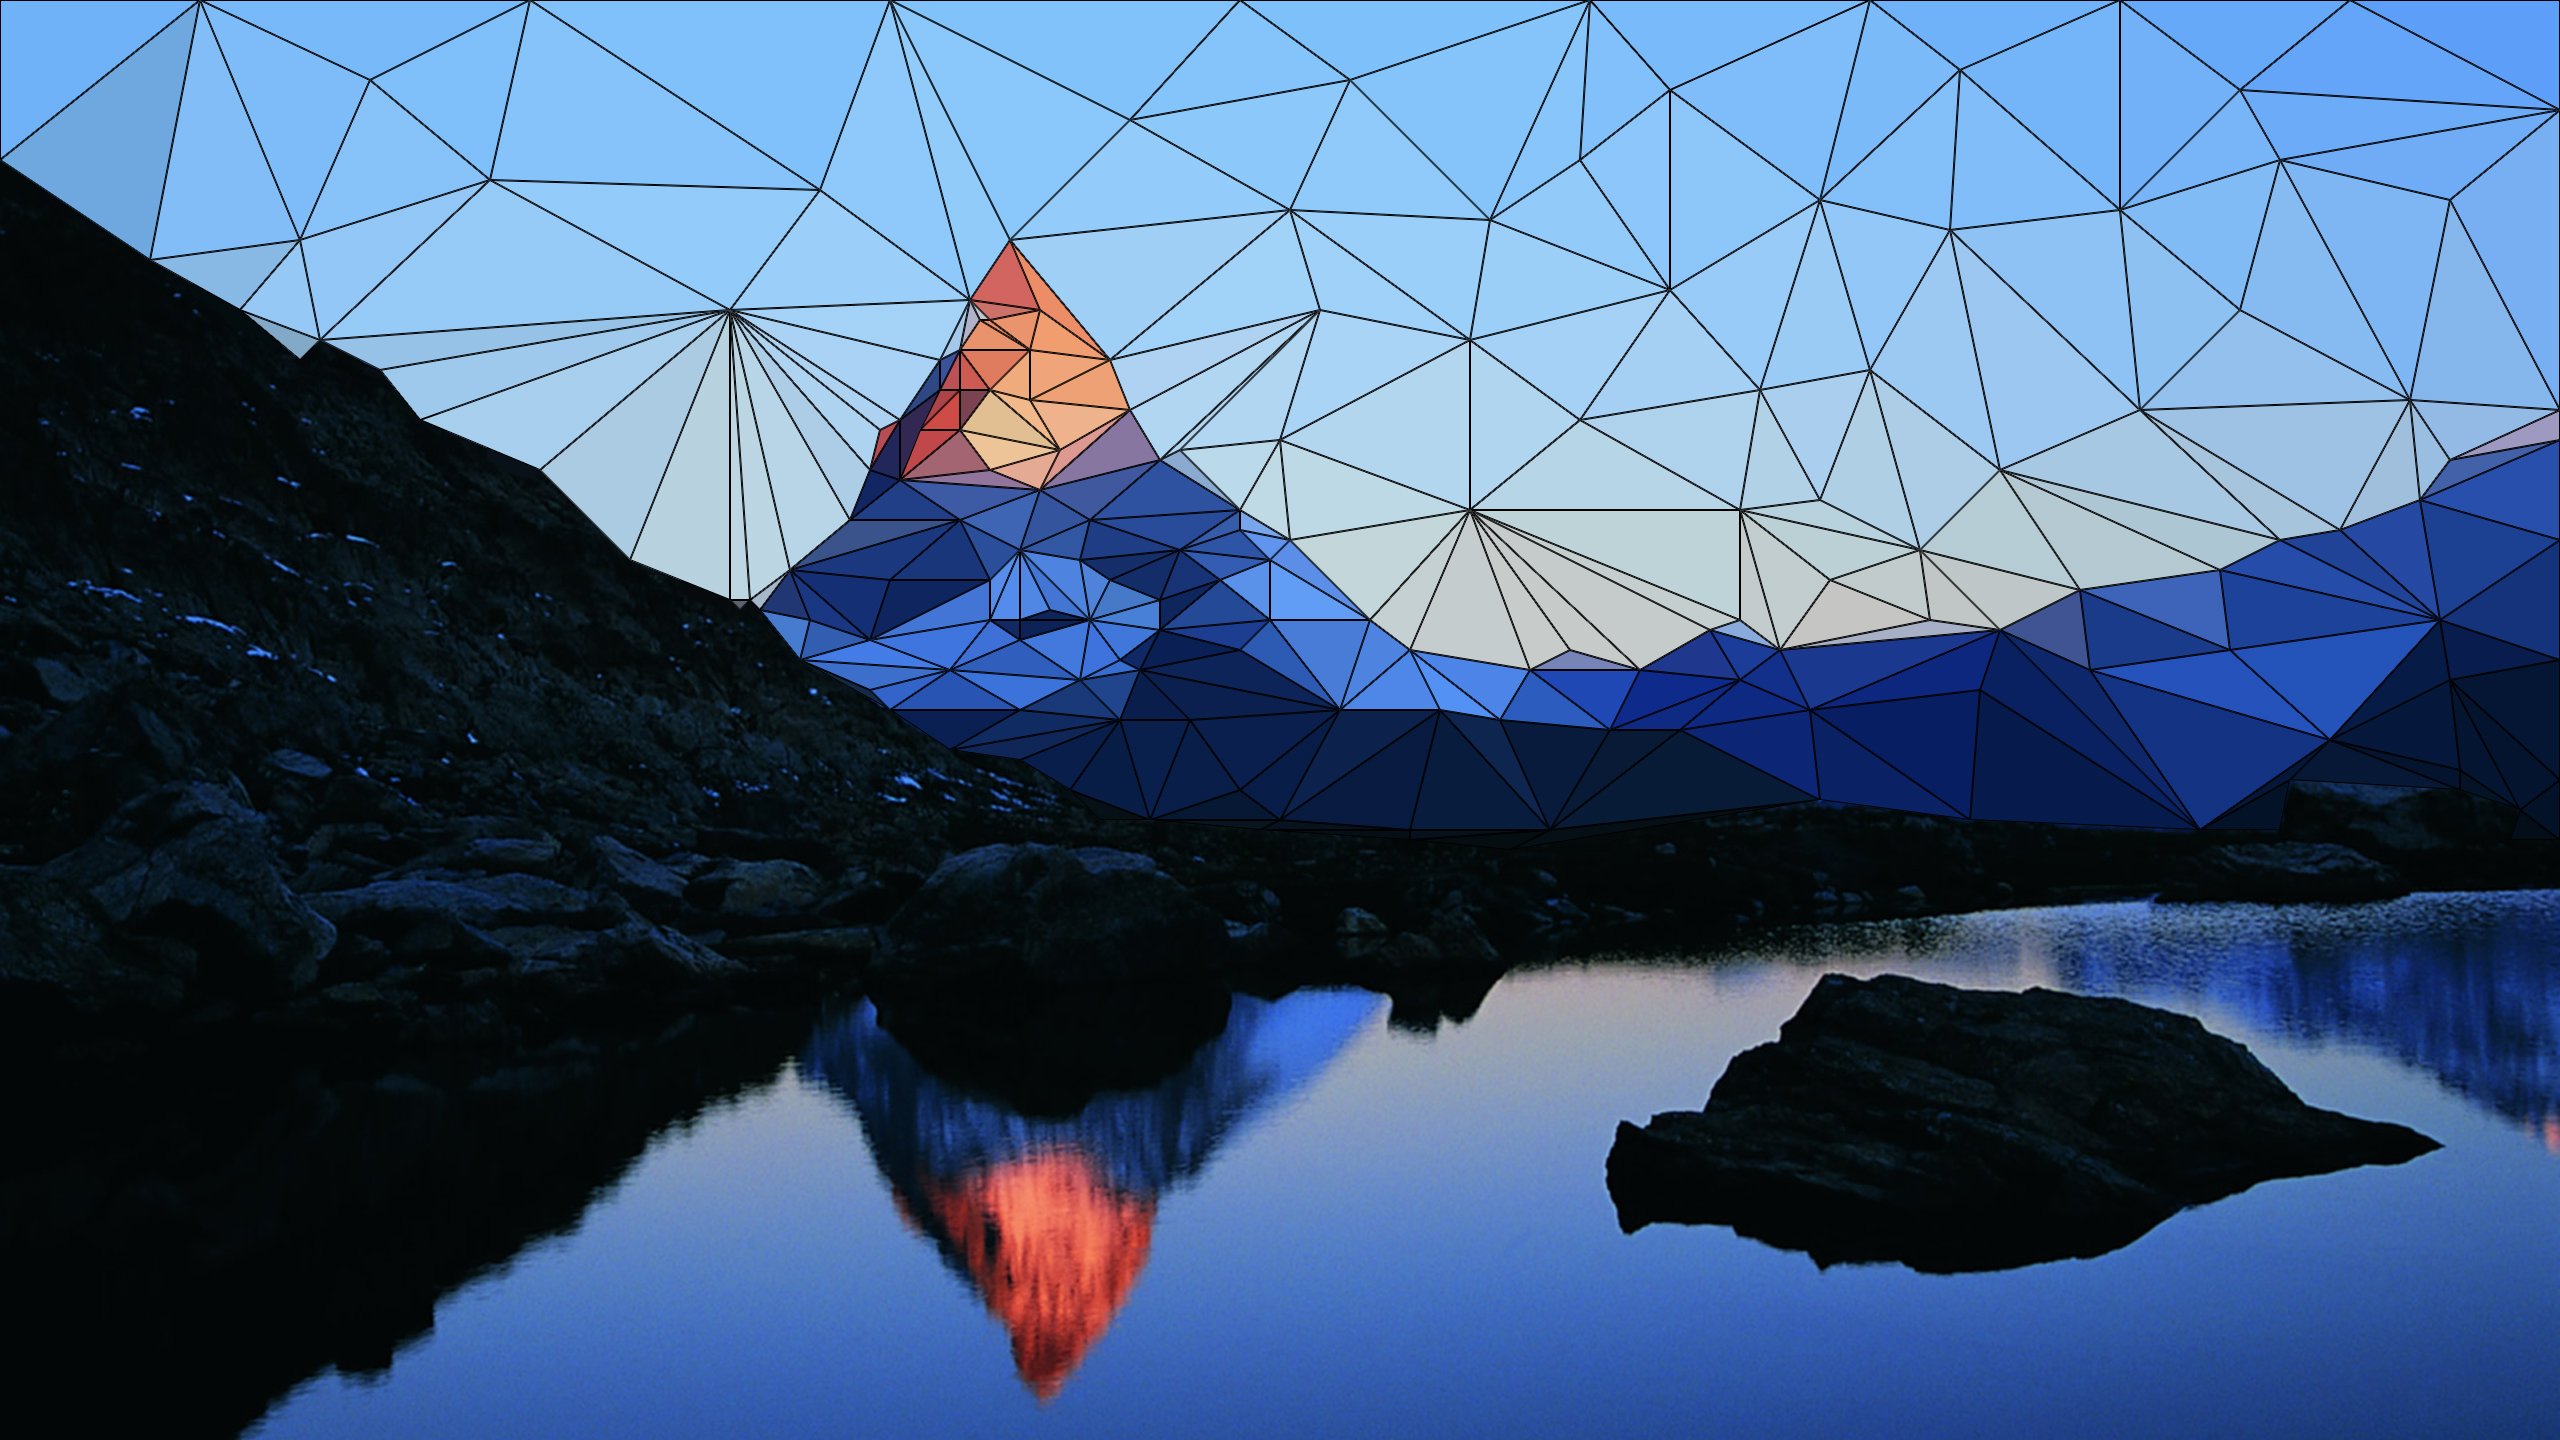 Beautiful Wallpaper Mountain Triangle - mountain_triangle_scene_by_tgs266-d9h761b  2018_40853.jpg